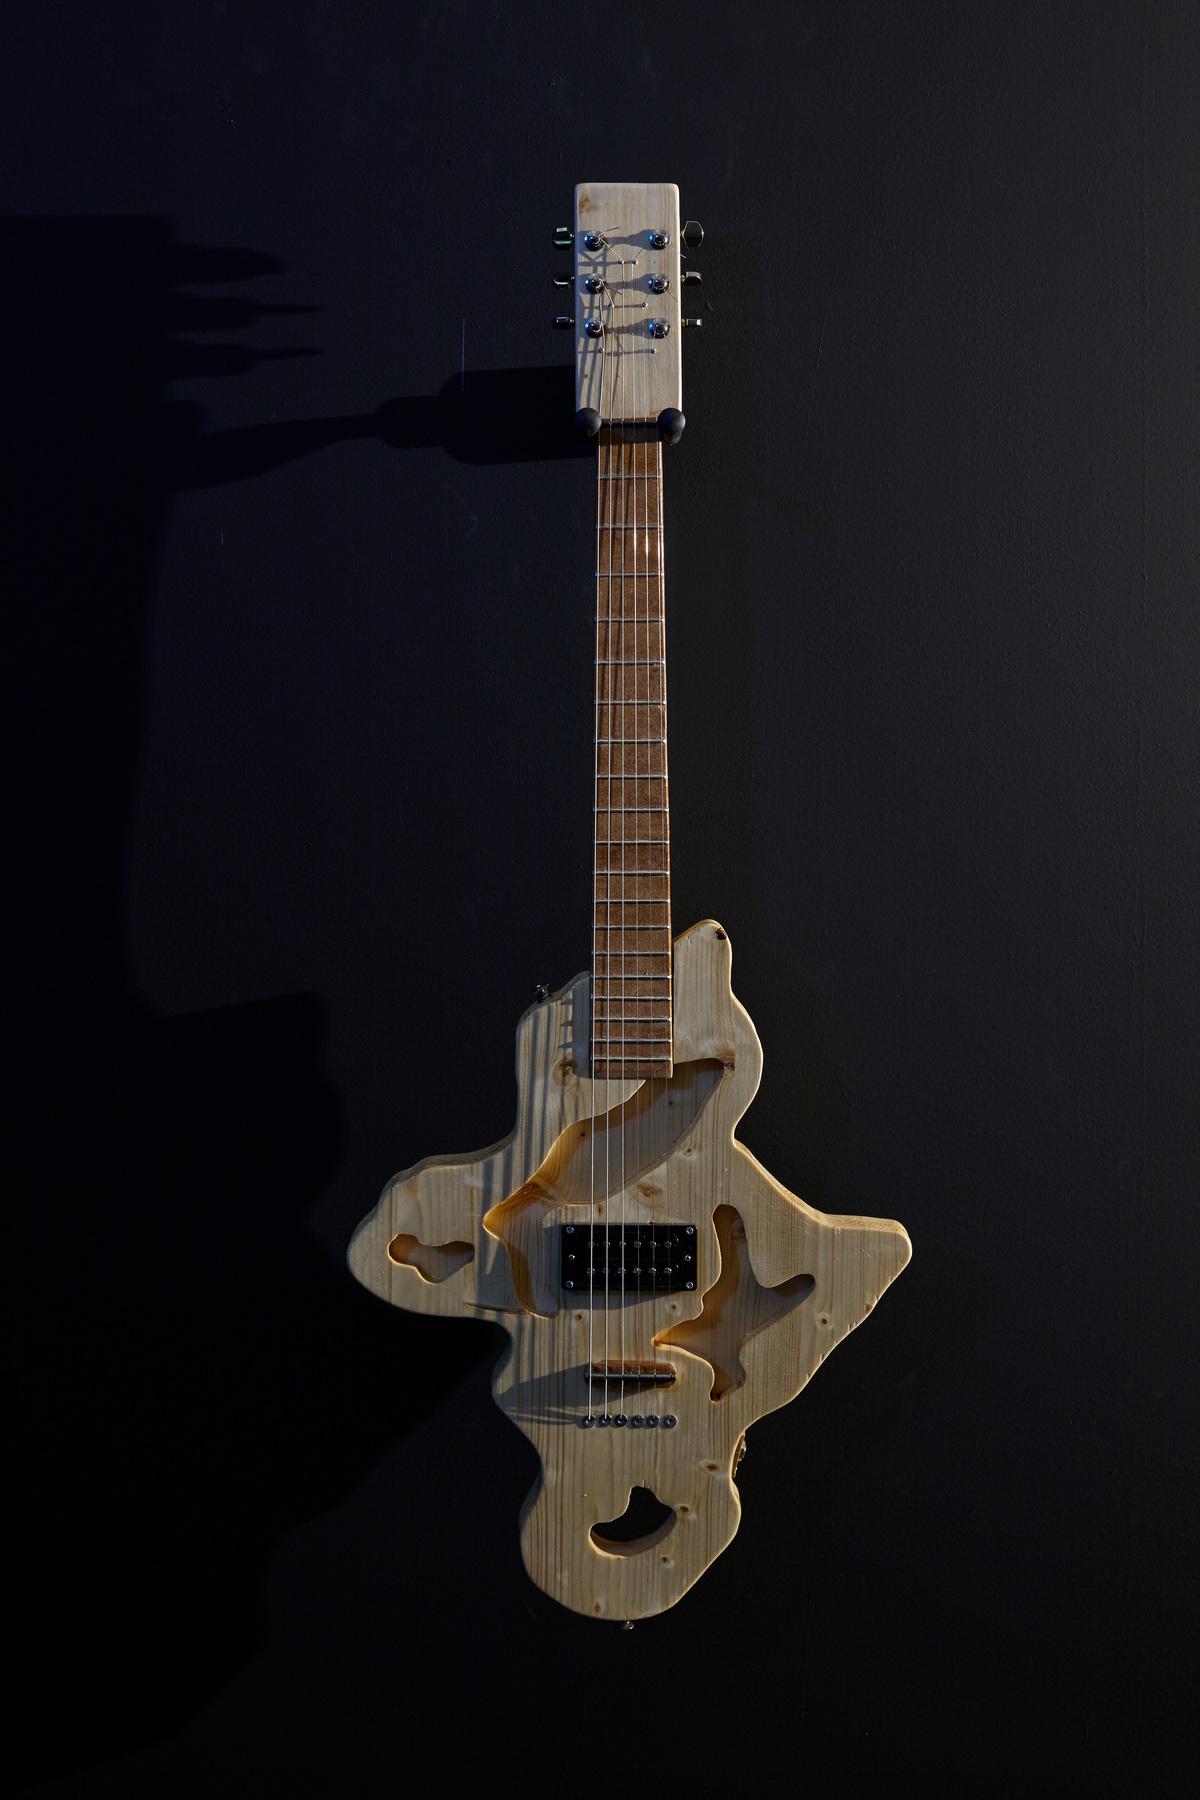 Flavio Merlo - Guitar VIII, (detail) 2015